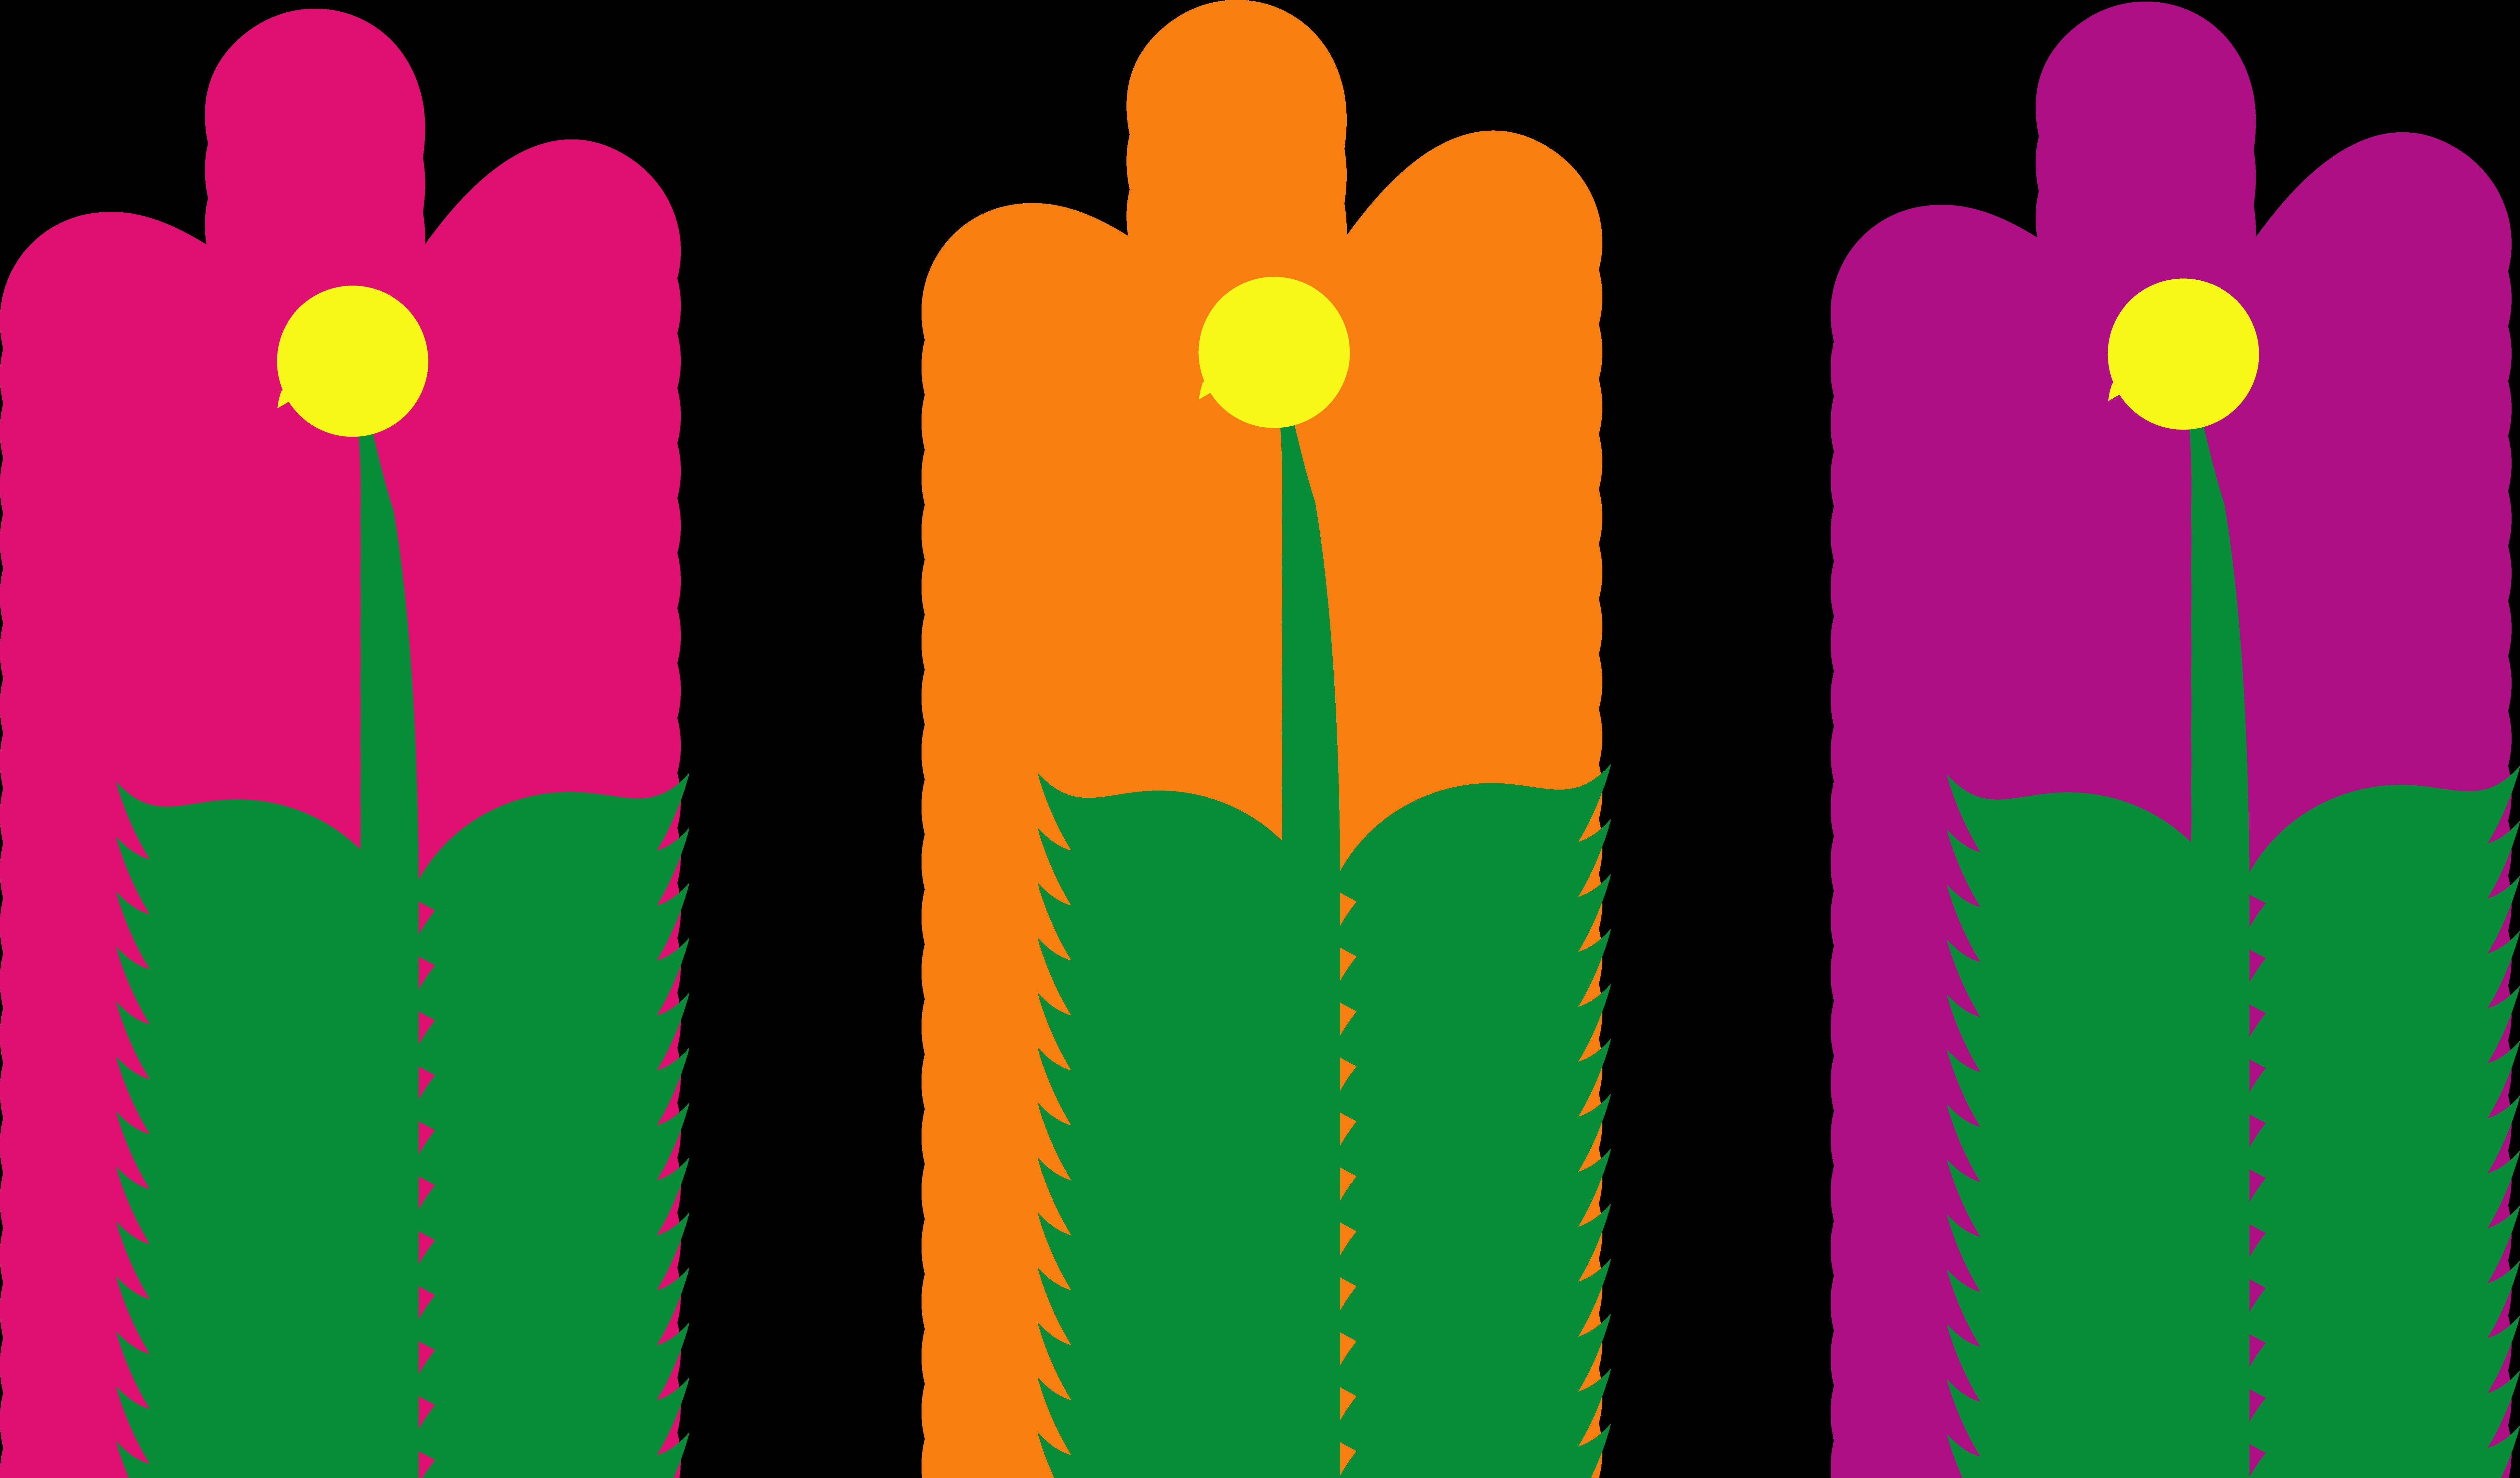 7747x4545 Tulip Flower Clip Art